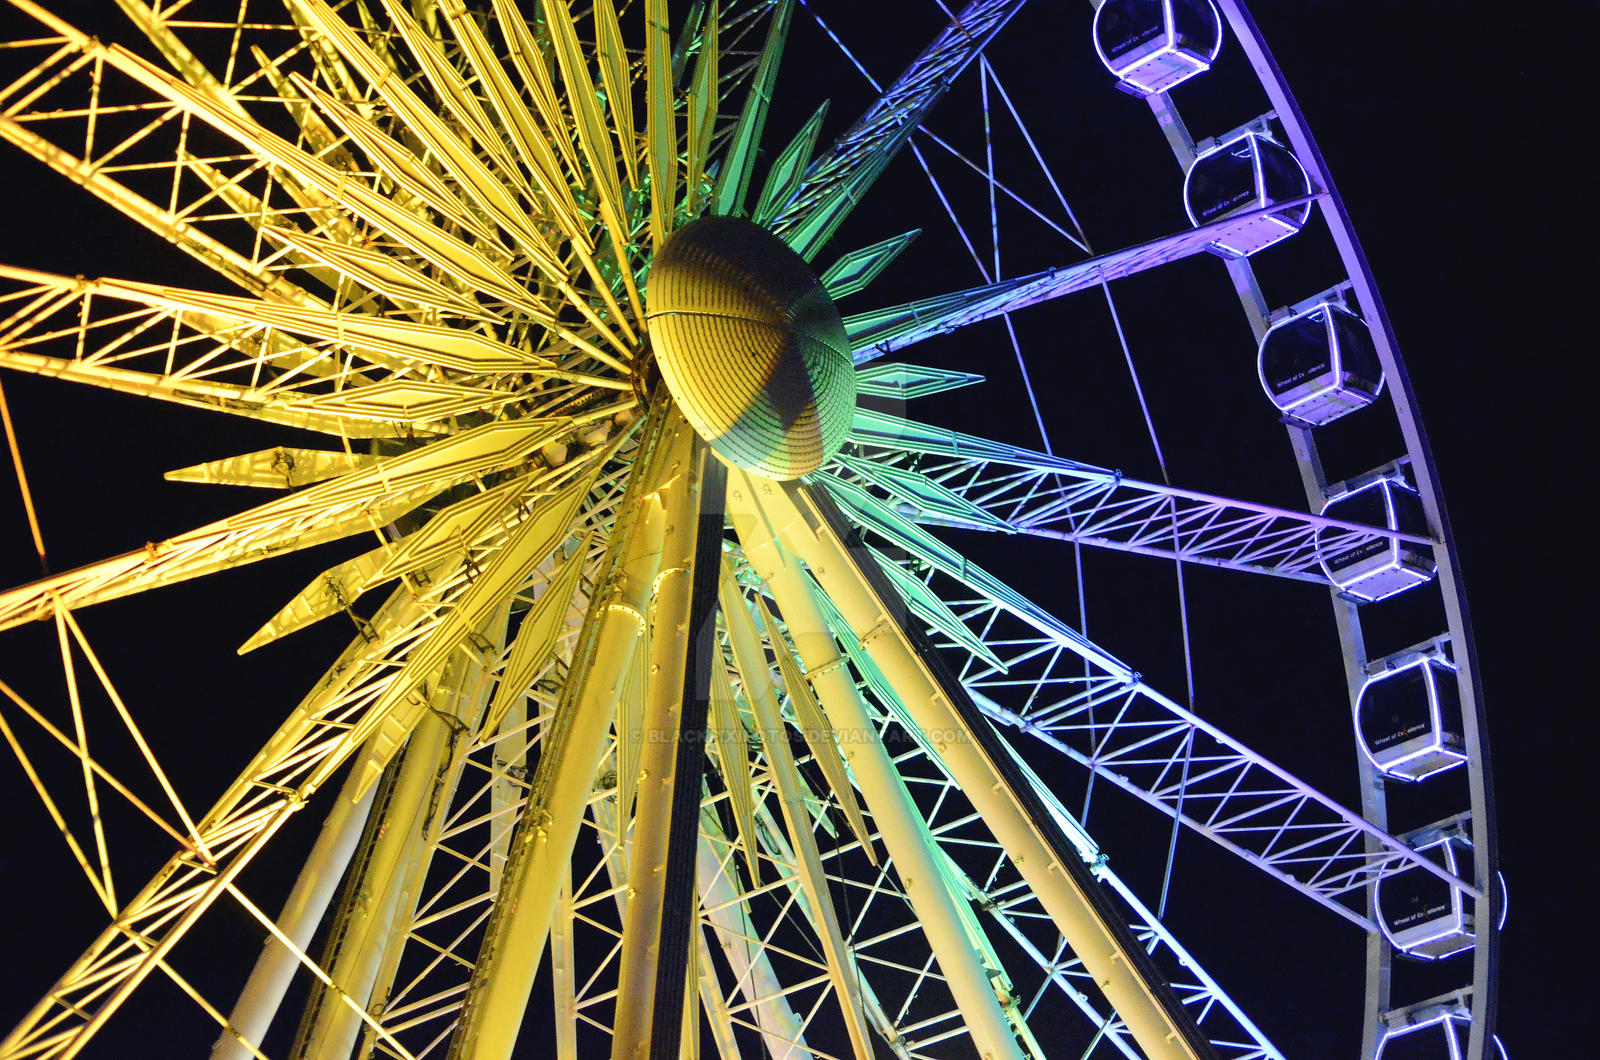 Rainbow wheel by blackpixifotos